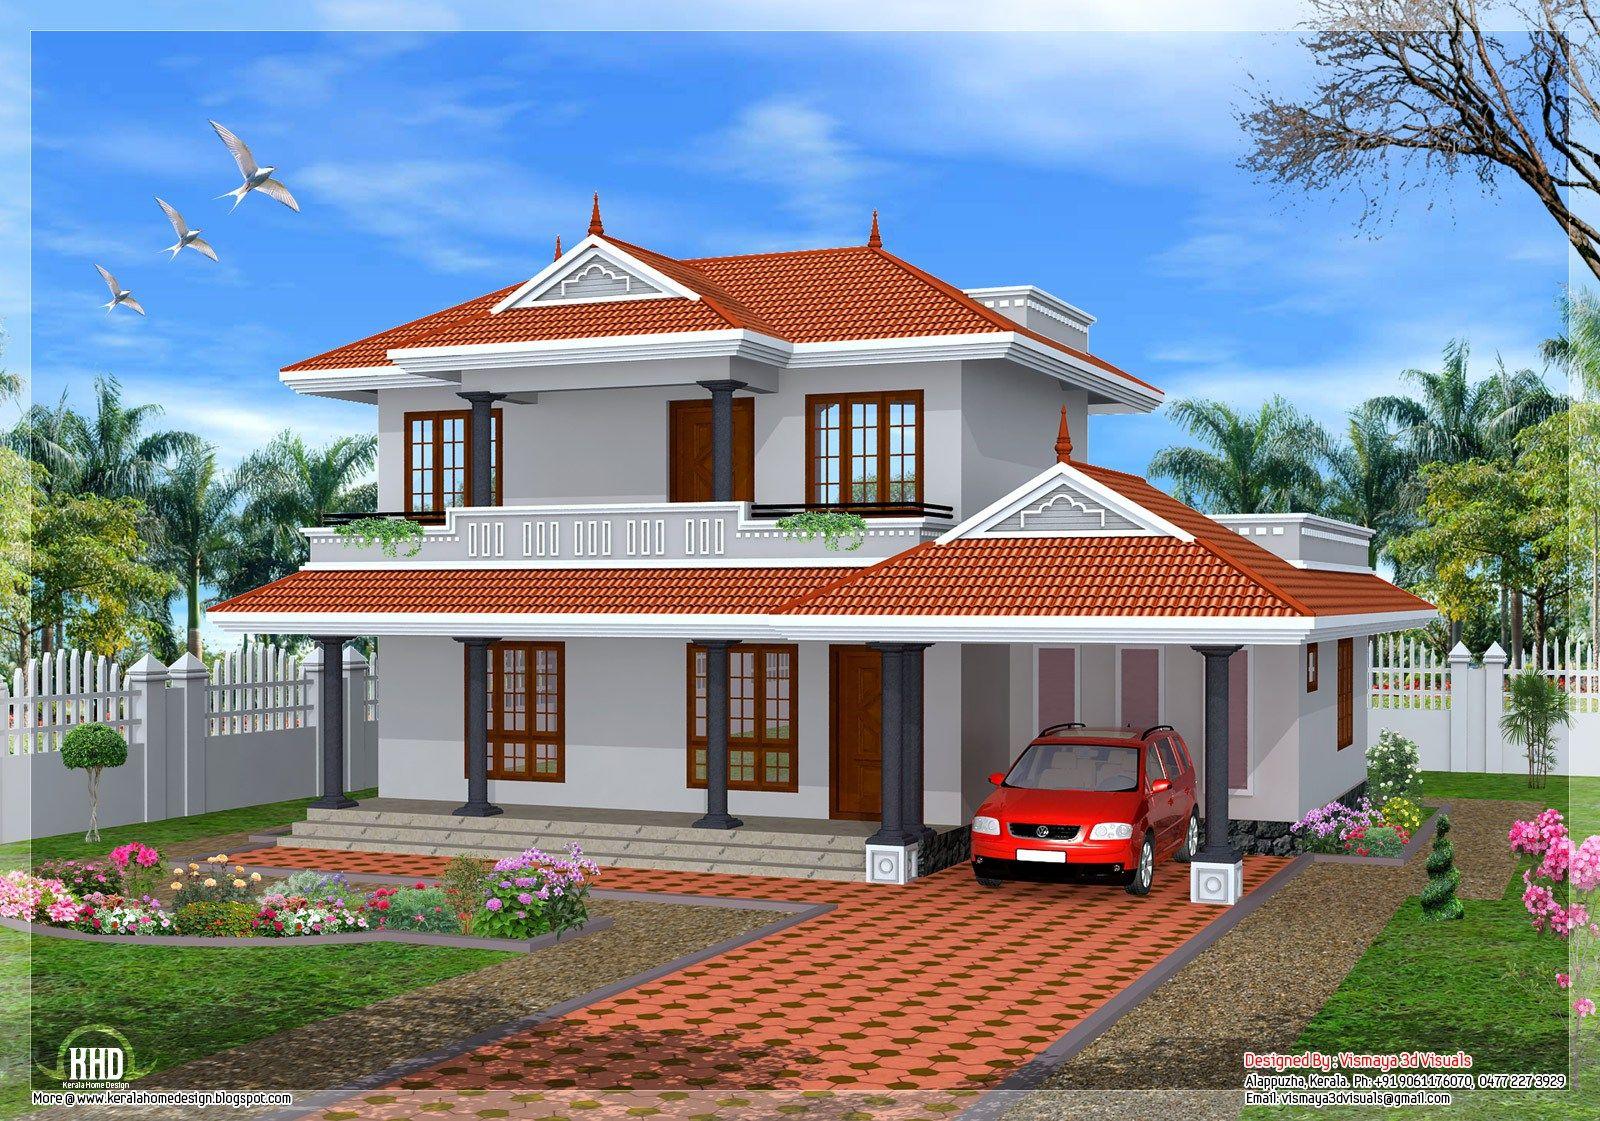 plan sq ft kerala home design architecture house plans